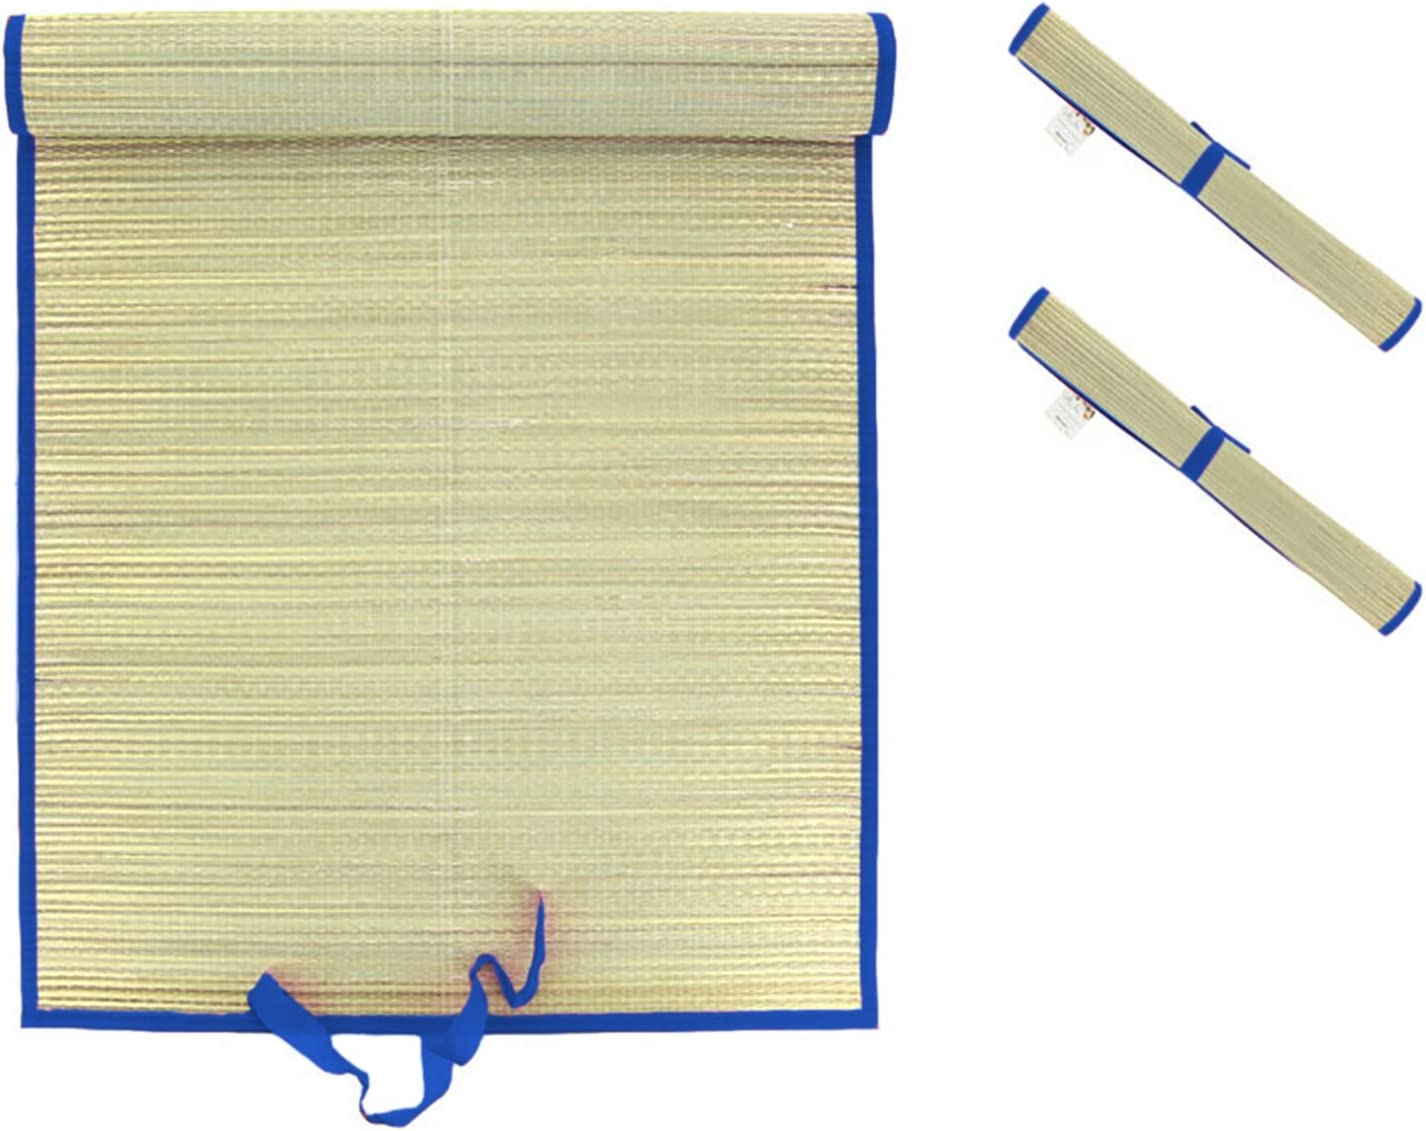 Mojawo Juego de 2XL–Manta de Playa Playa (Rafia Alfombrilla Paja Picnic Matte–Manta Playa Tumbona Azul L180X b60cm